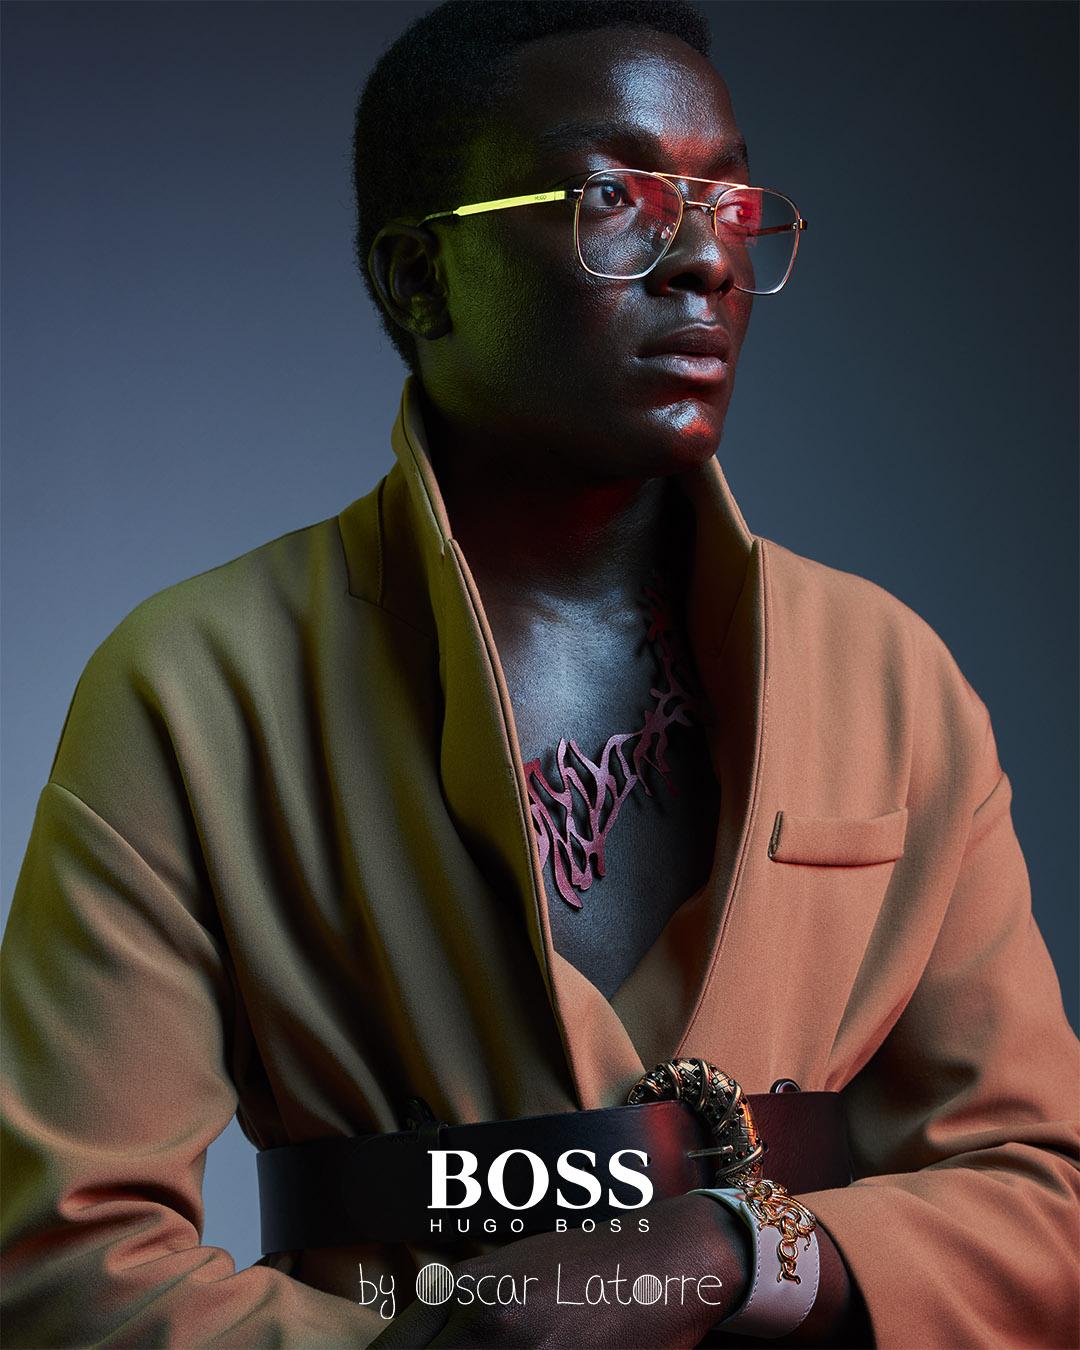 Hugo Boss by Oscar Latorre